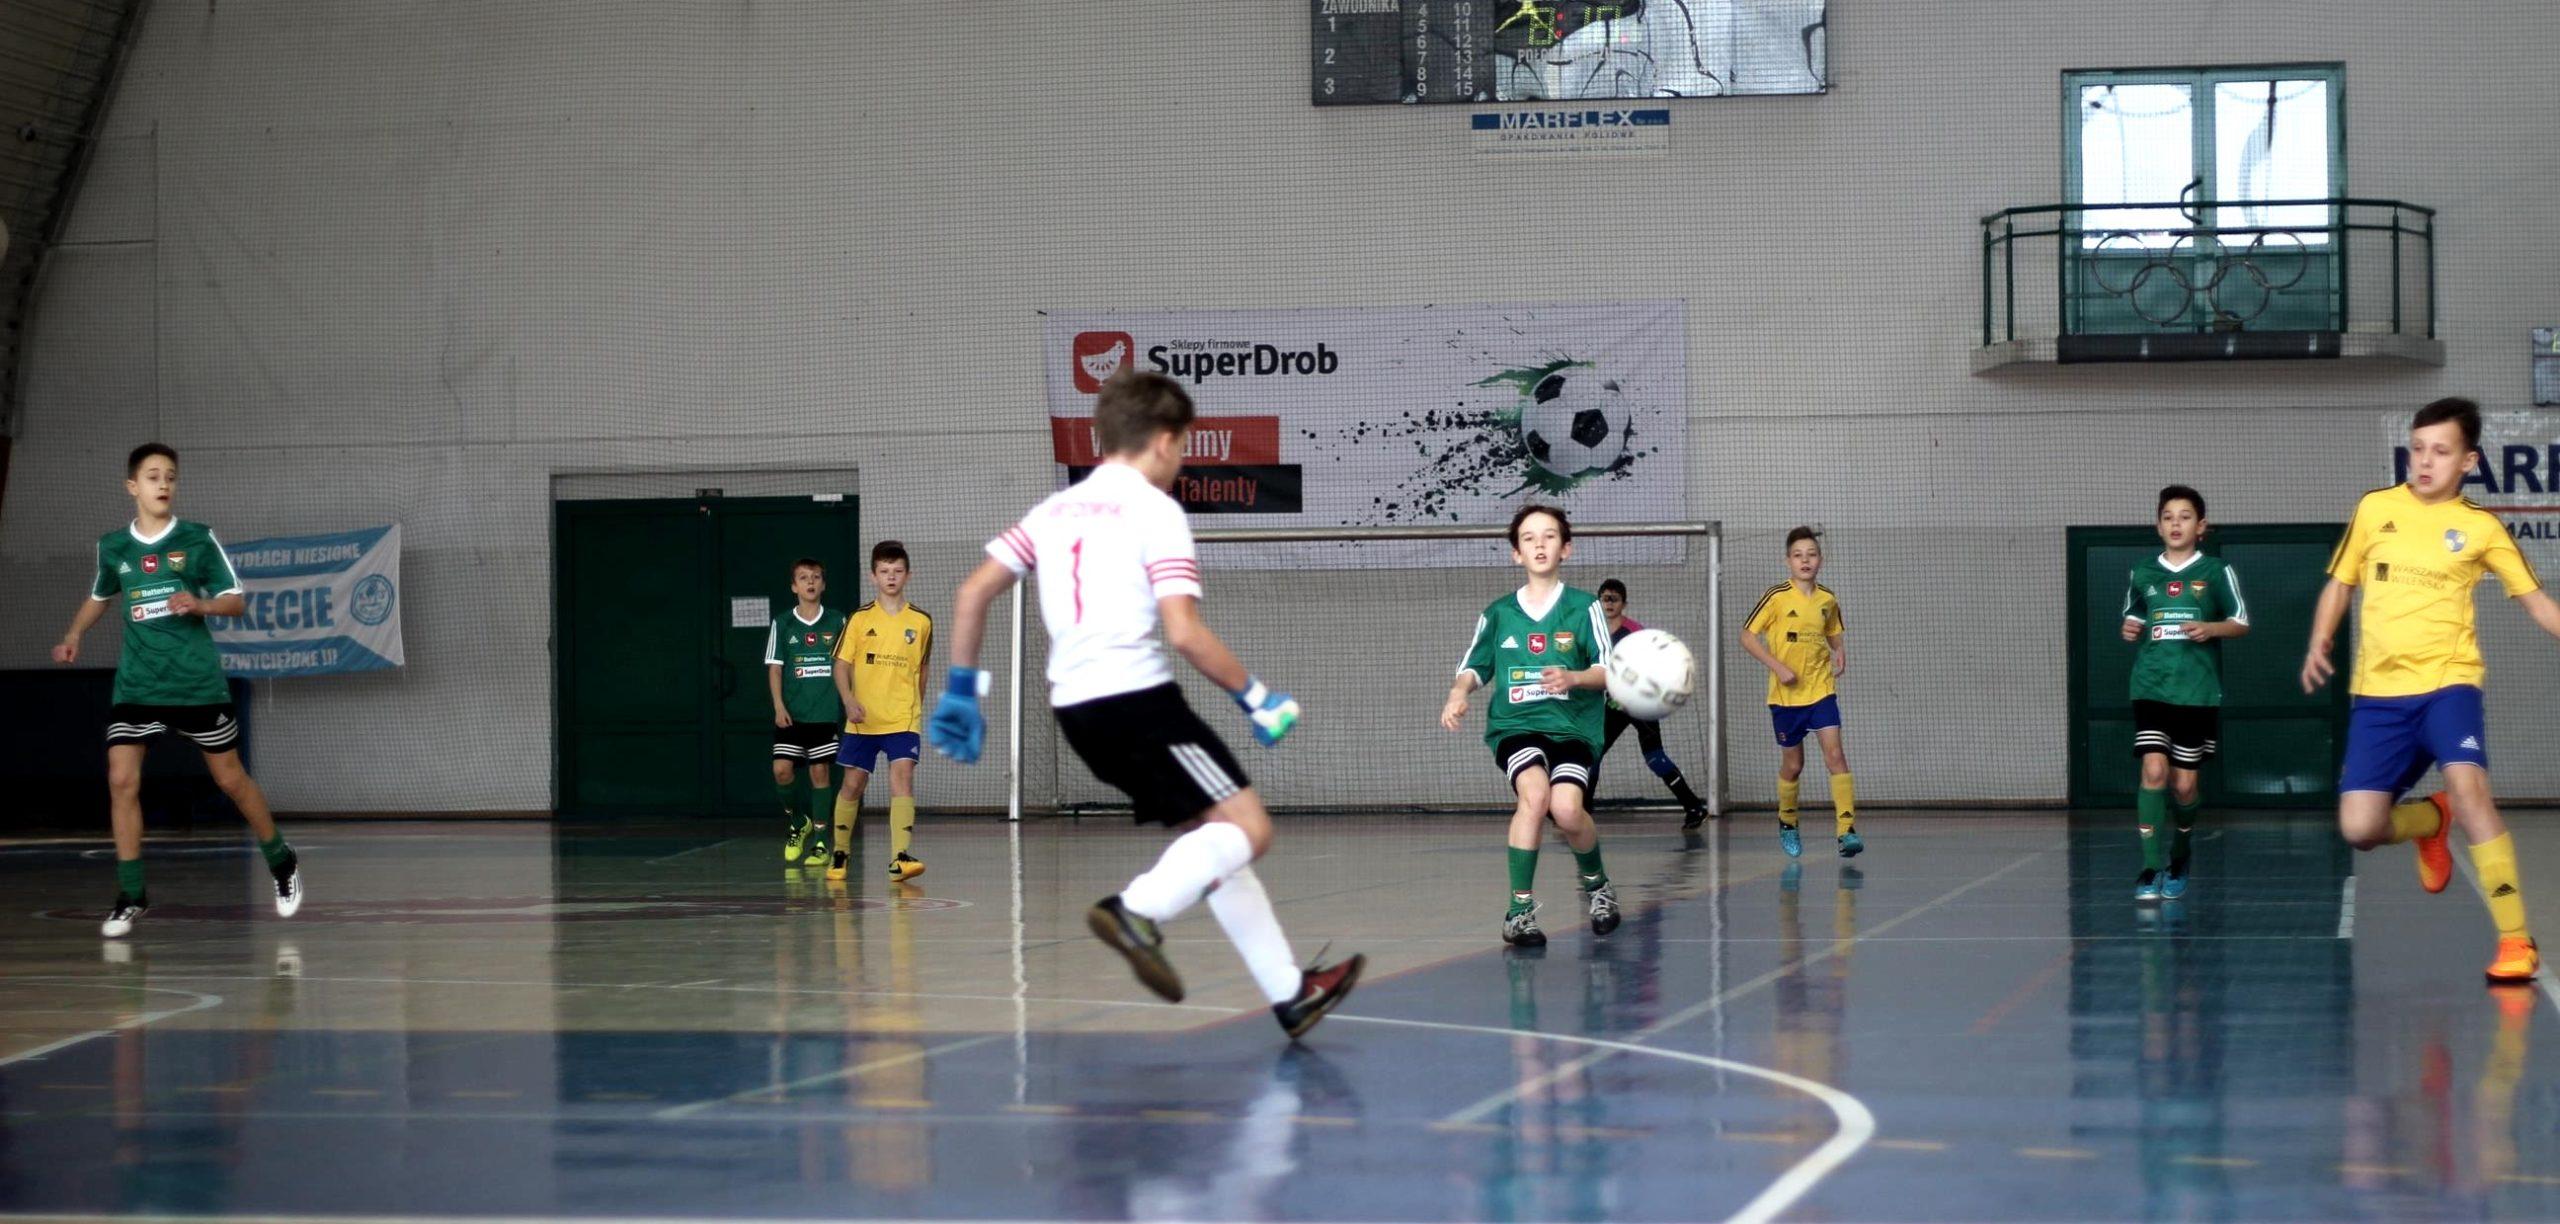 Mazur Karczew 2016 - SuperDrob Cup 2016